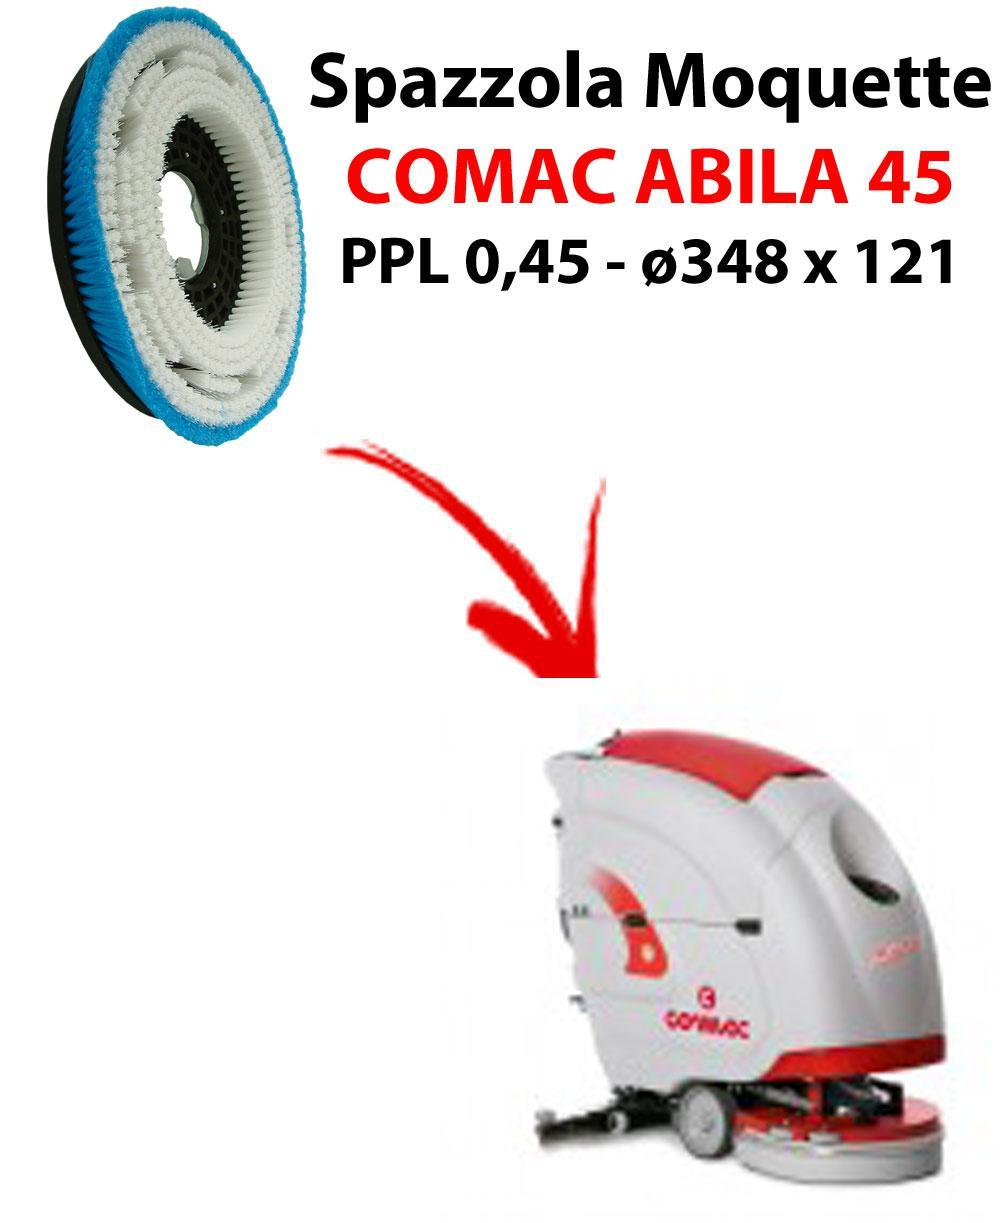 Cepillo MOQUETTE  para fregadora COMAC ABILA 45. modelo: PPL 0,45 C/FLANGIA ø348 X 121